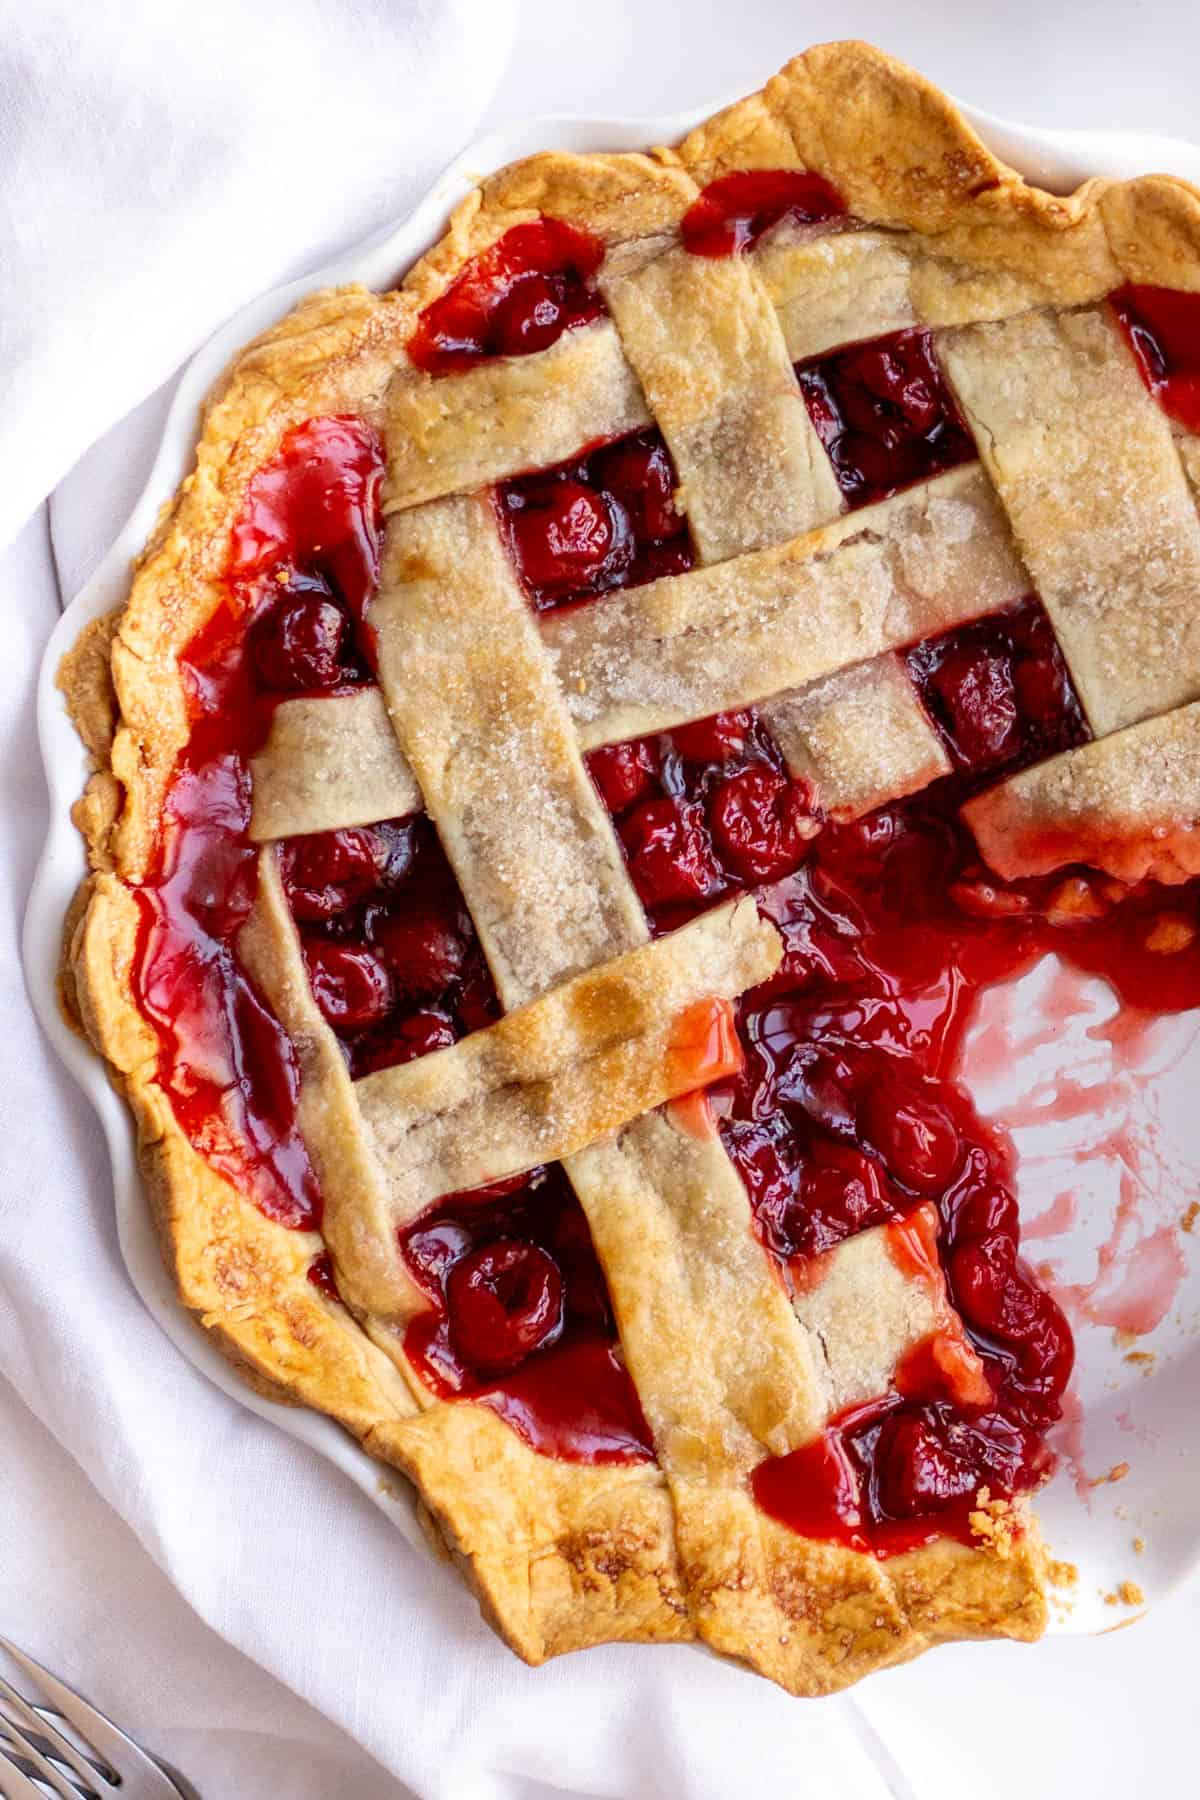 cherry pie with lattice design served in a white pie dish